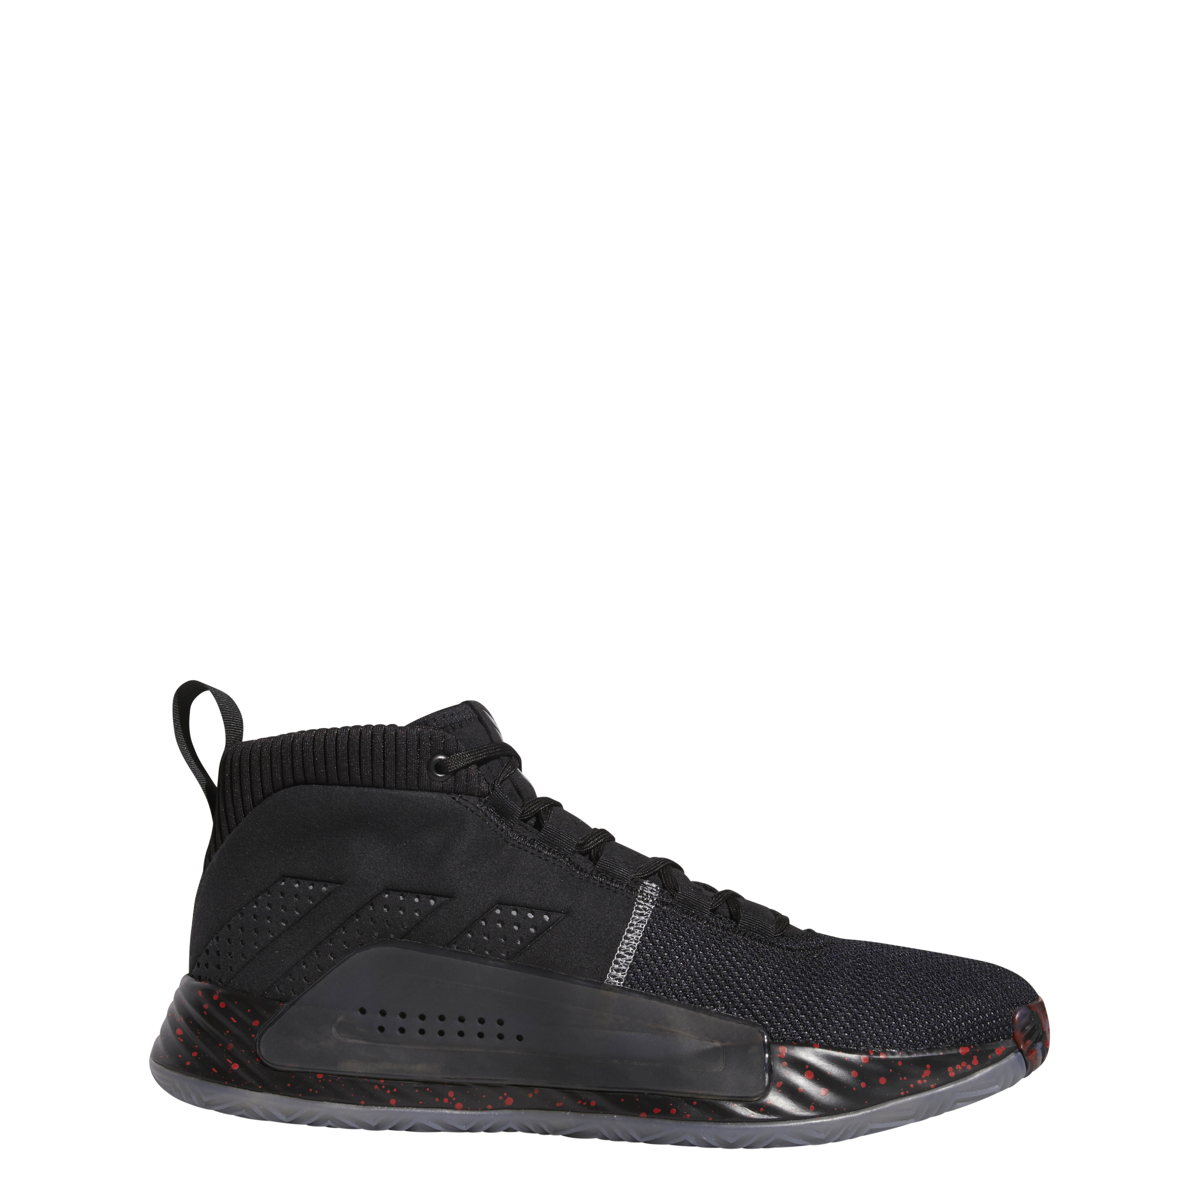 premium selection 6c477 7ebe0 Details about Men s Adidas Dame 5 Basketball Shoe Black Grey